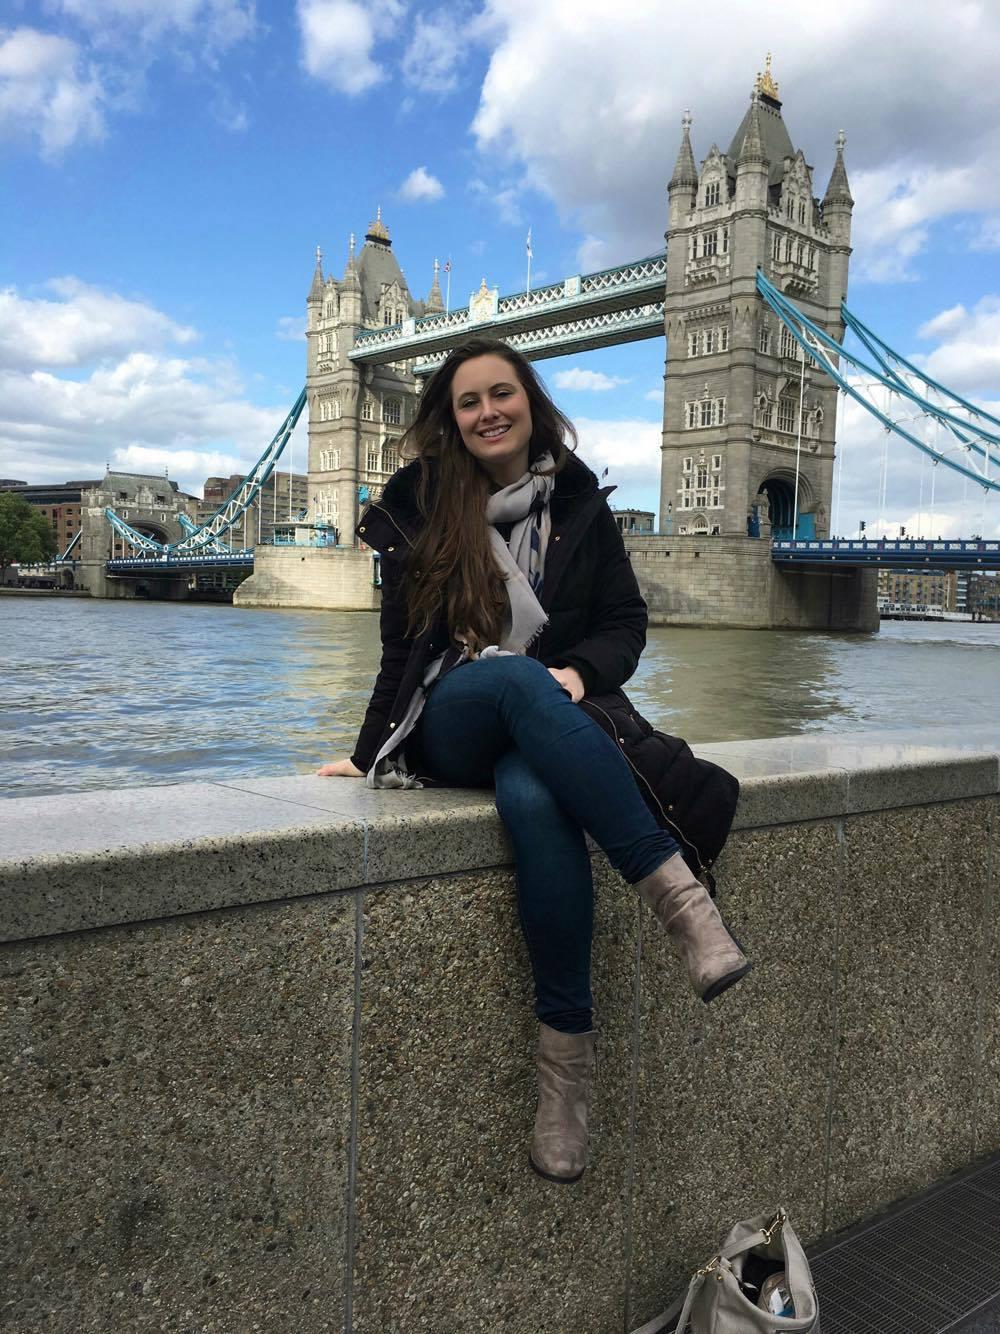 Courtney Ireland by Tower Bridge